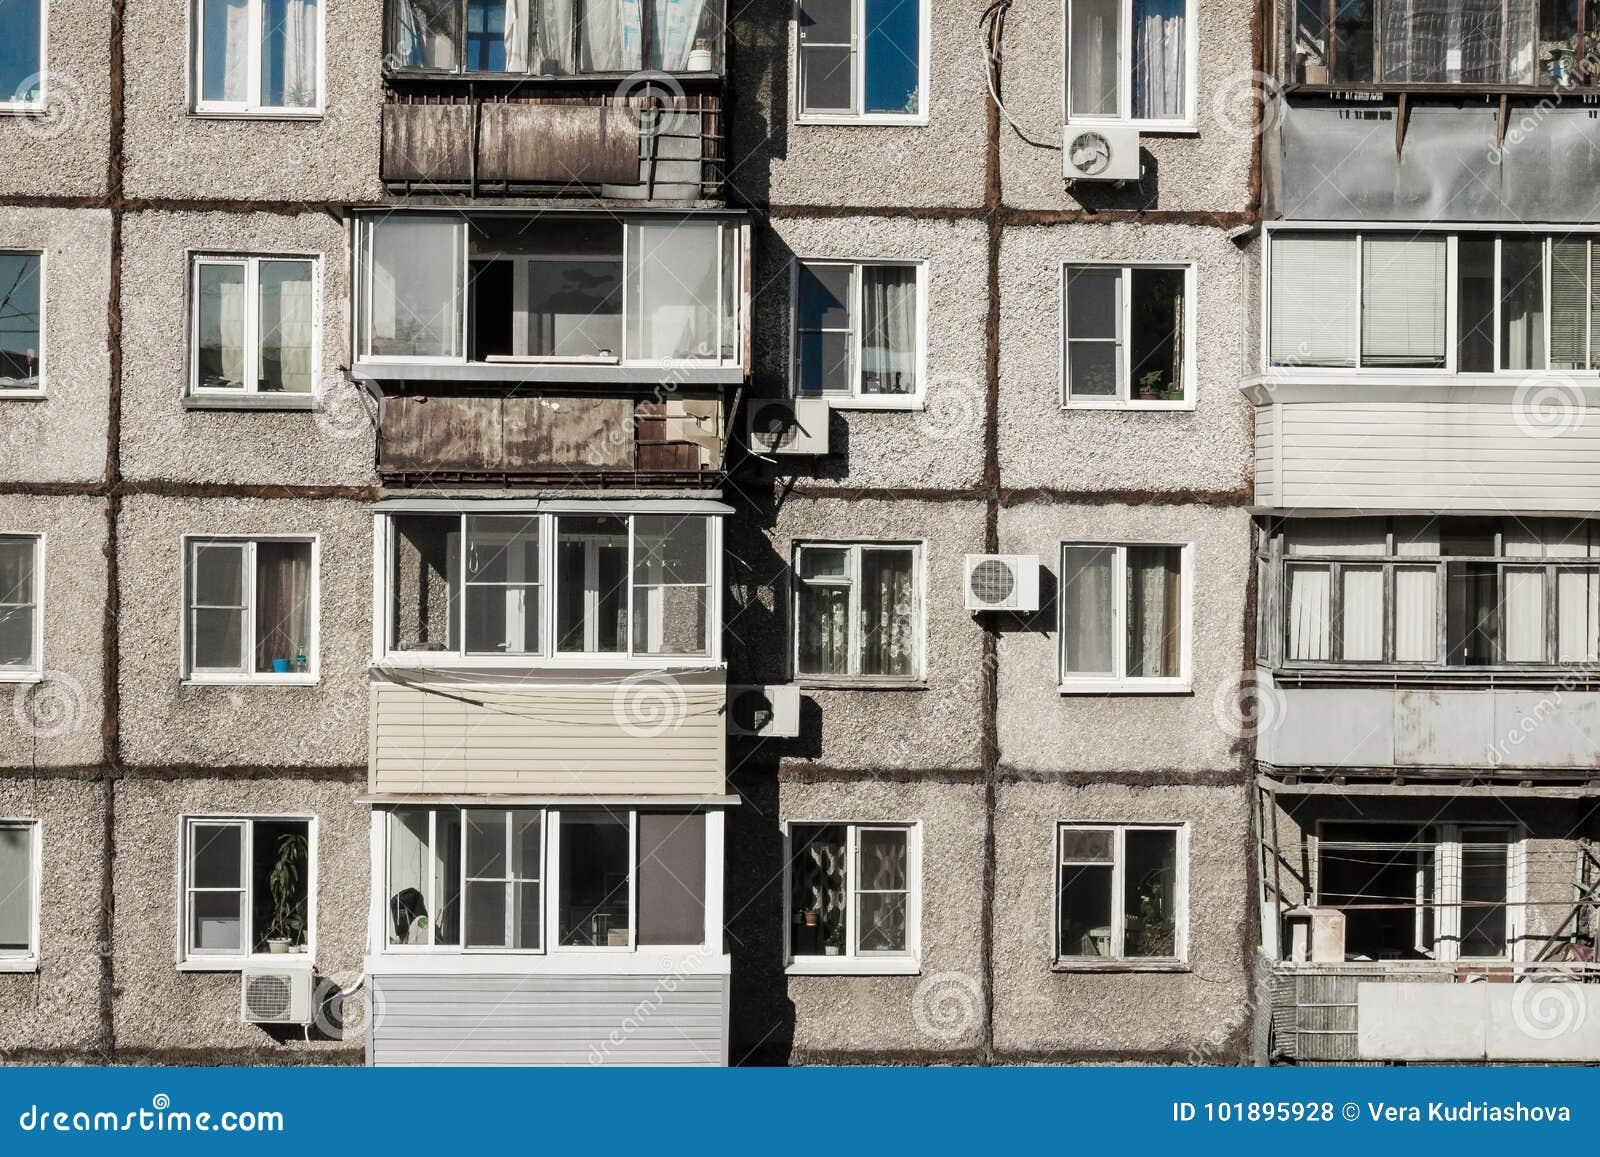 Oude, slechte, goedkope huisvesting